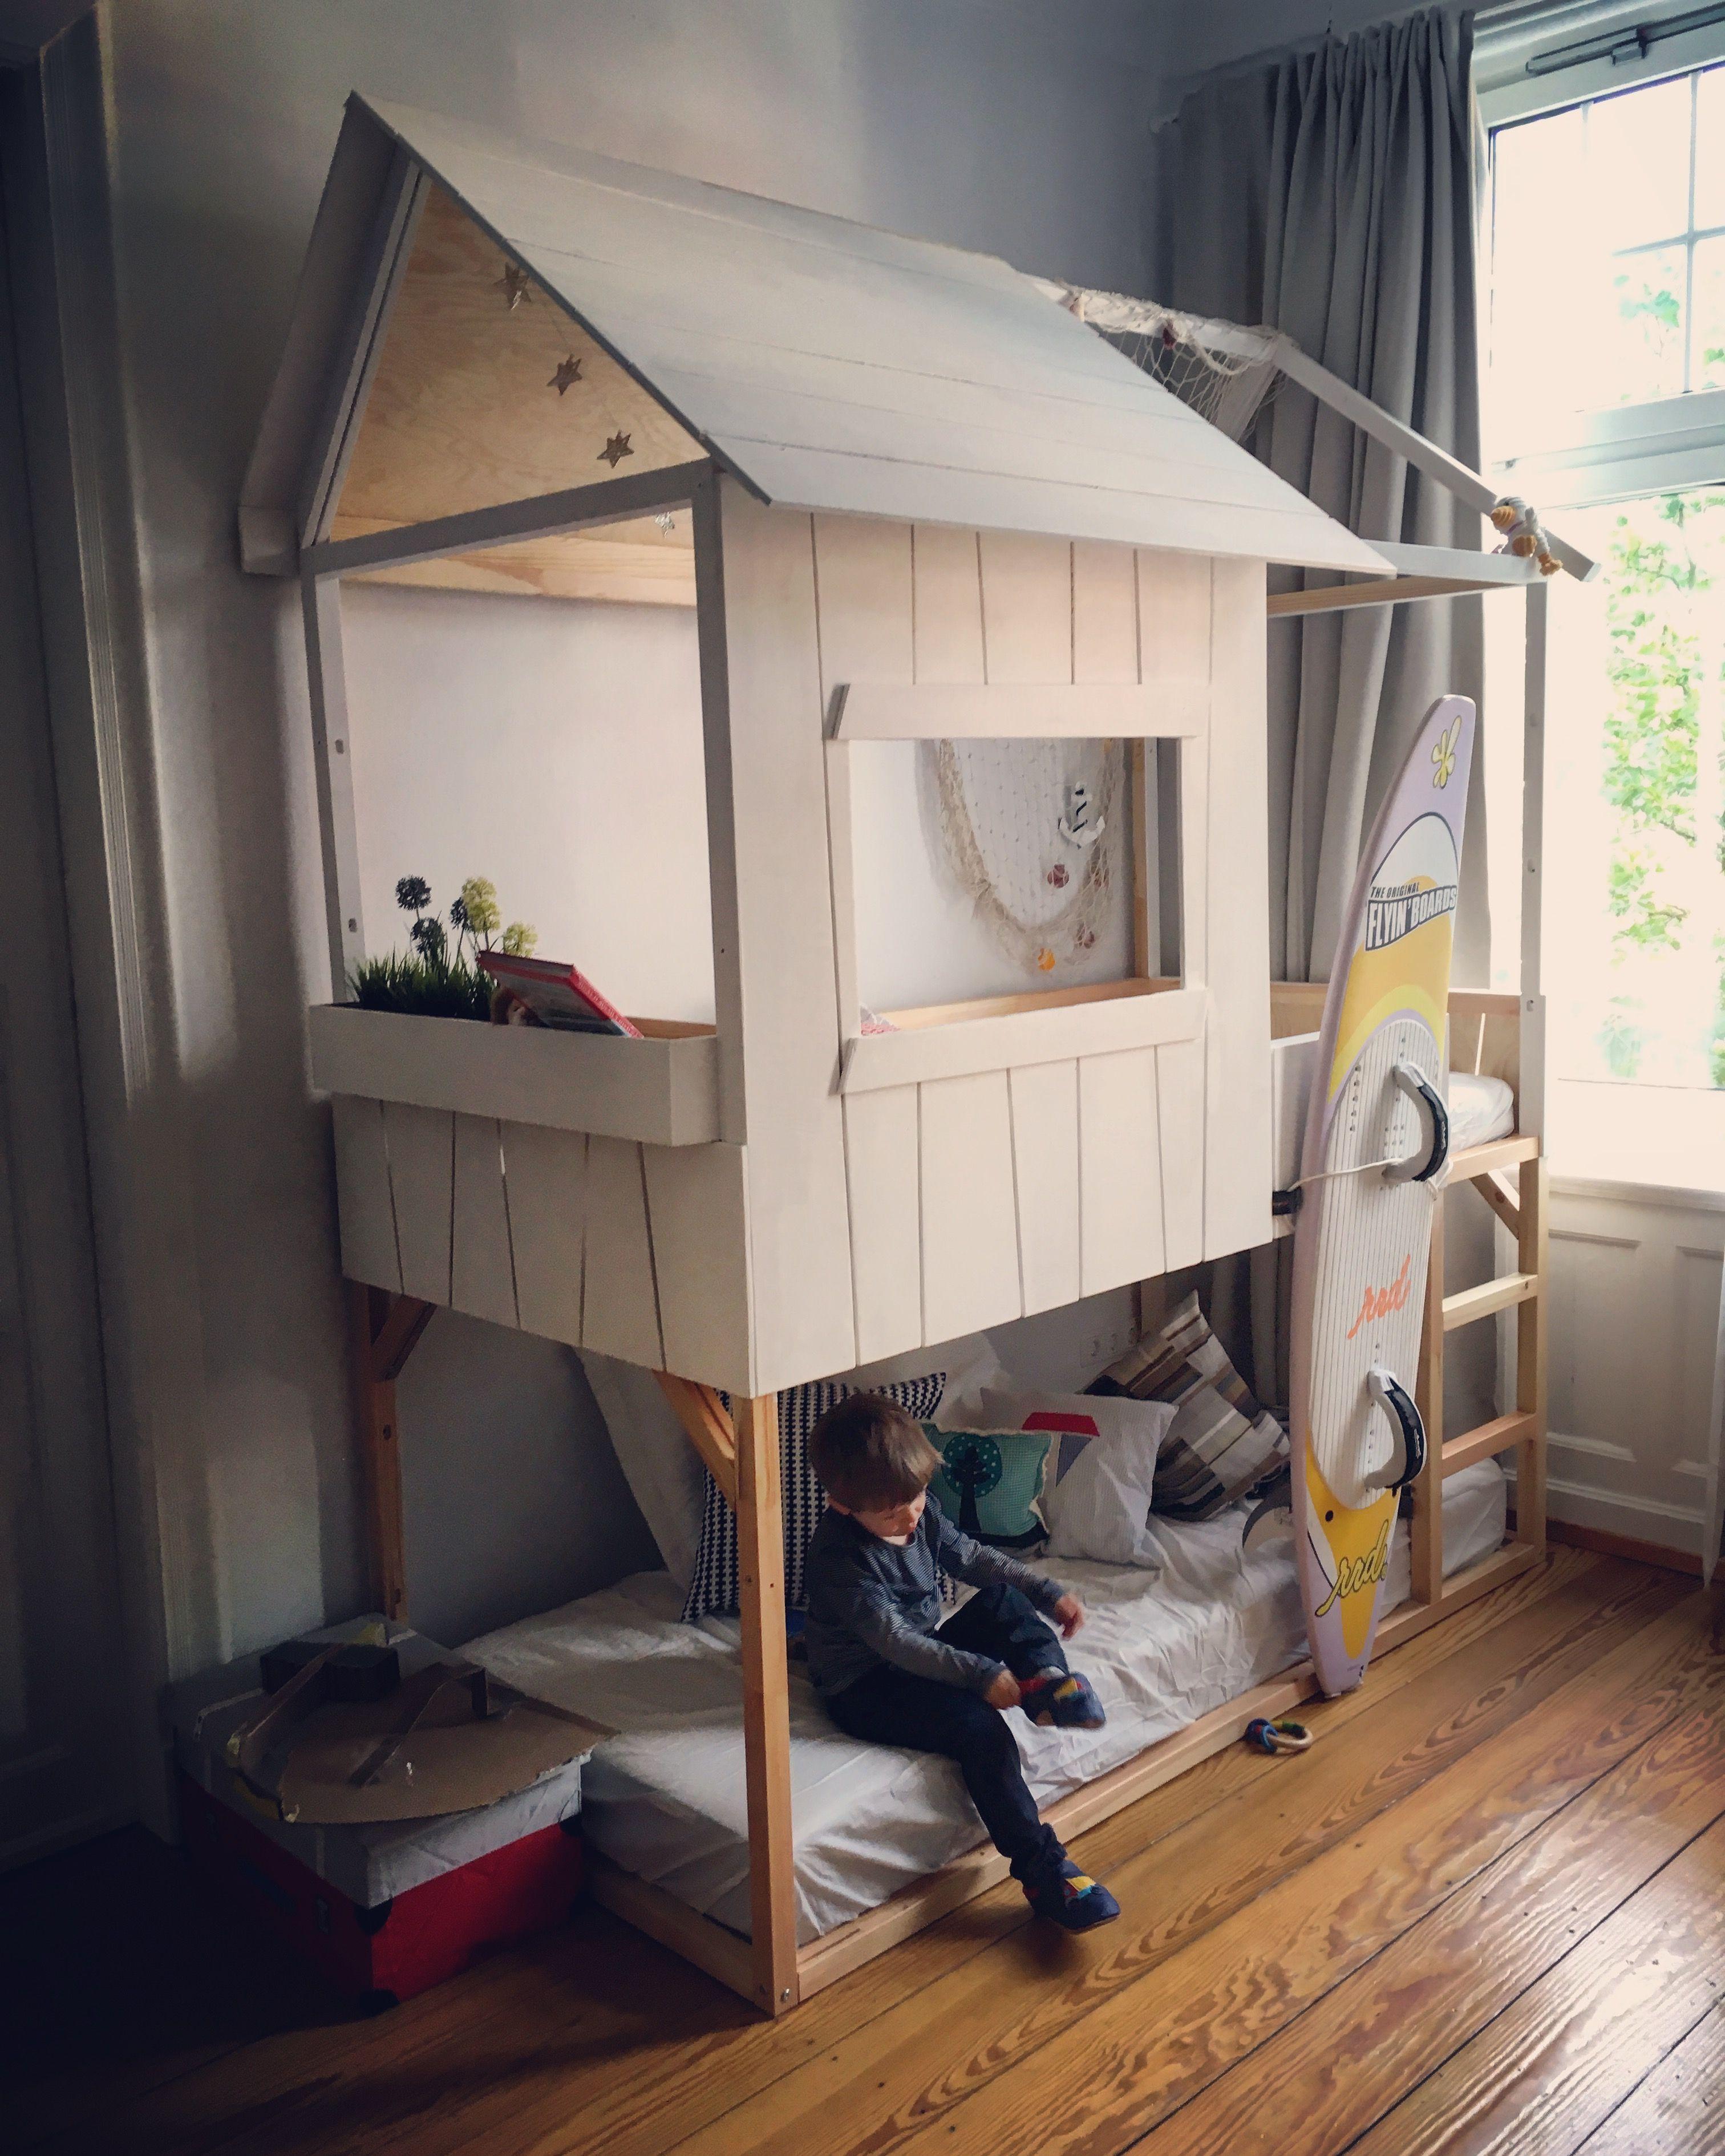 Ikea Double Kura Hack Two Kura Beds Made To One Playhouse